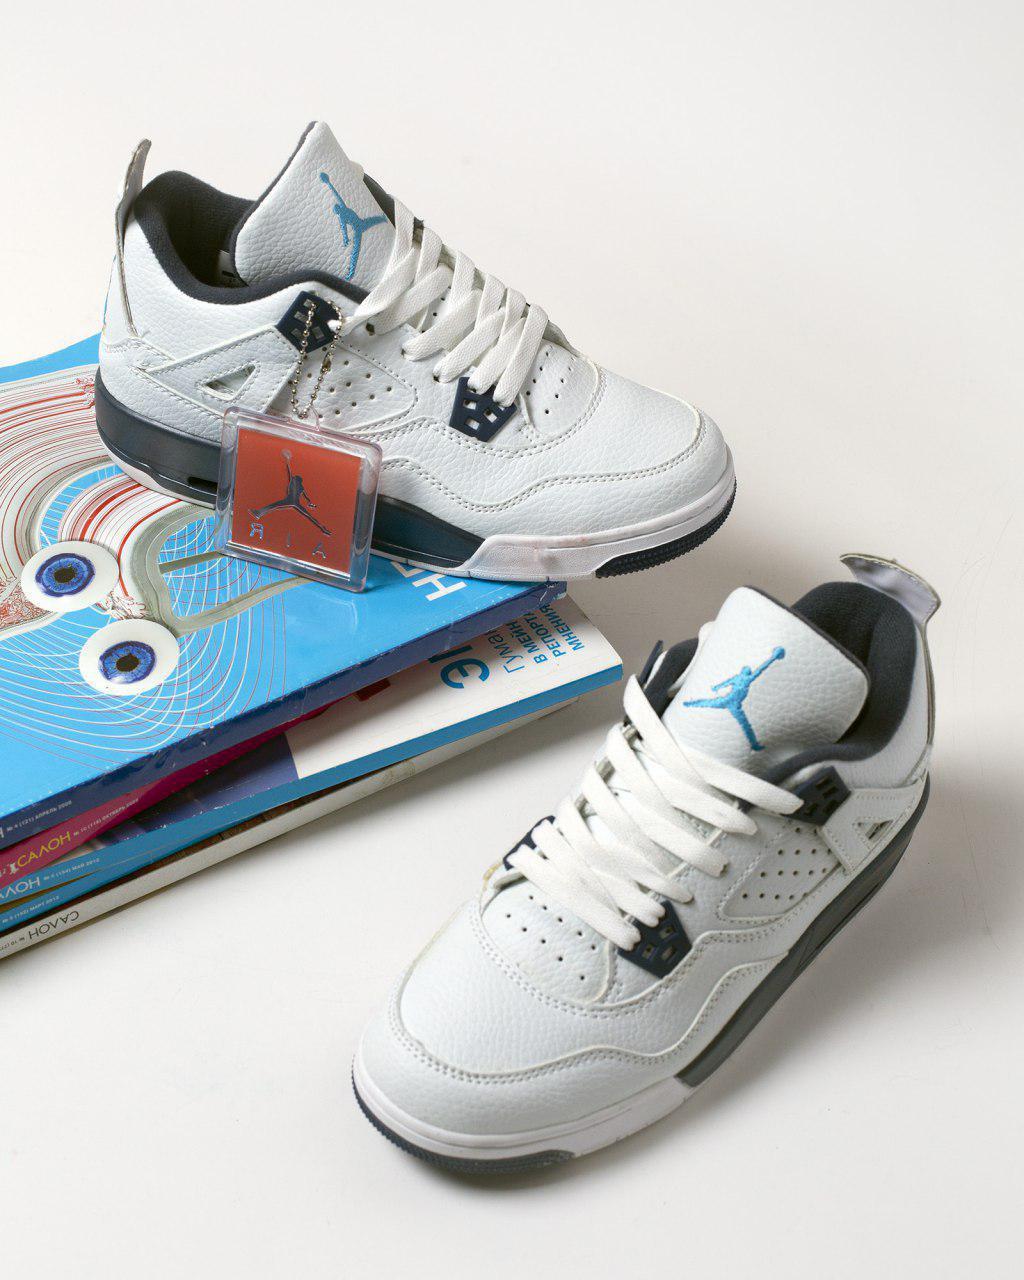 f9895f0a5b83 NIke Air Jordan 4 Retro Legend Blue